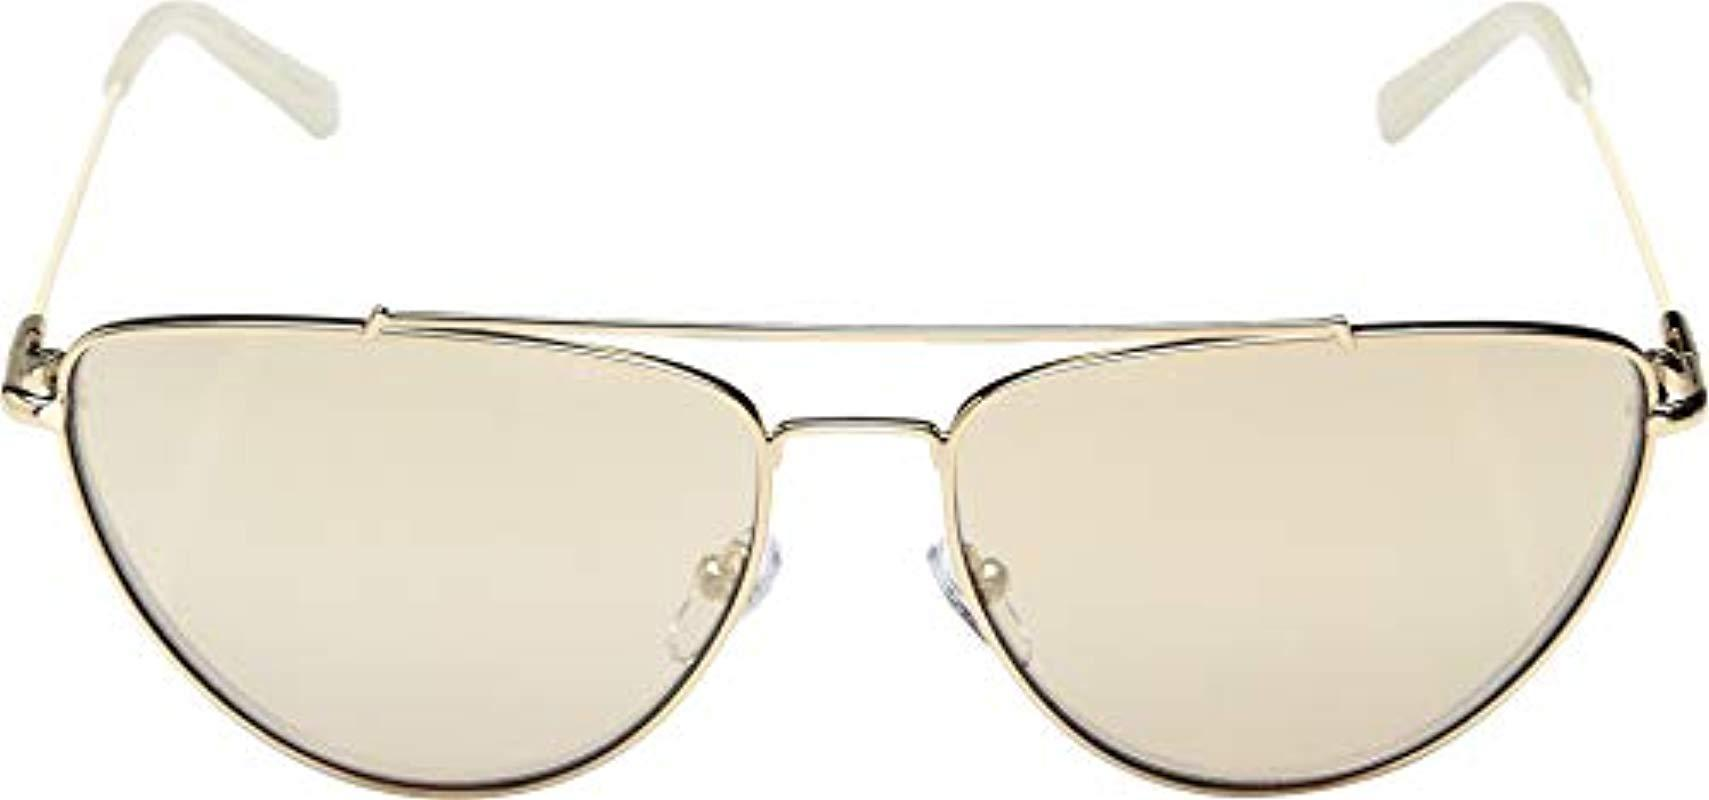 c7de76564873d ... Diane Von Furstenberg 122s Krista Aviator Sunglasses - Lyst. View  fullscreen